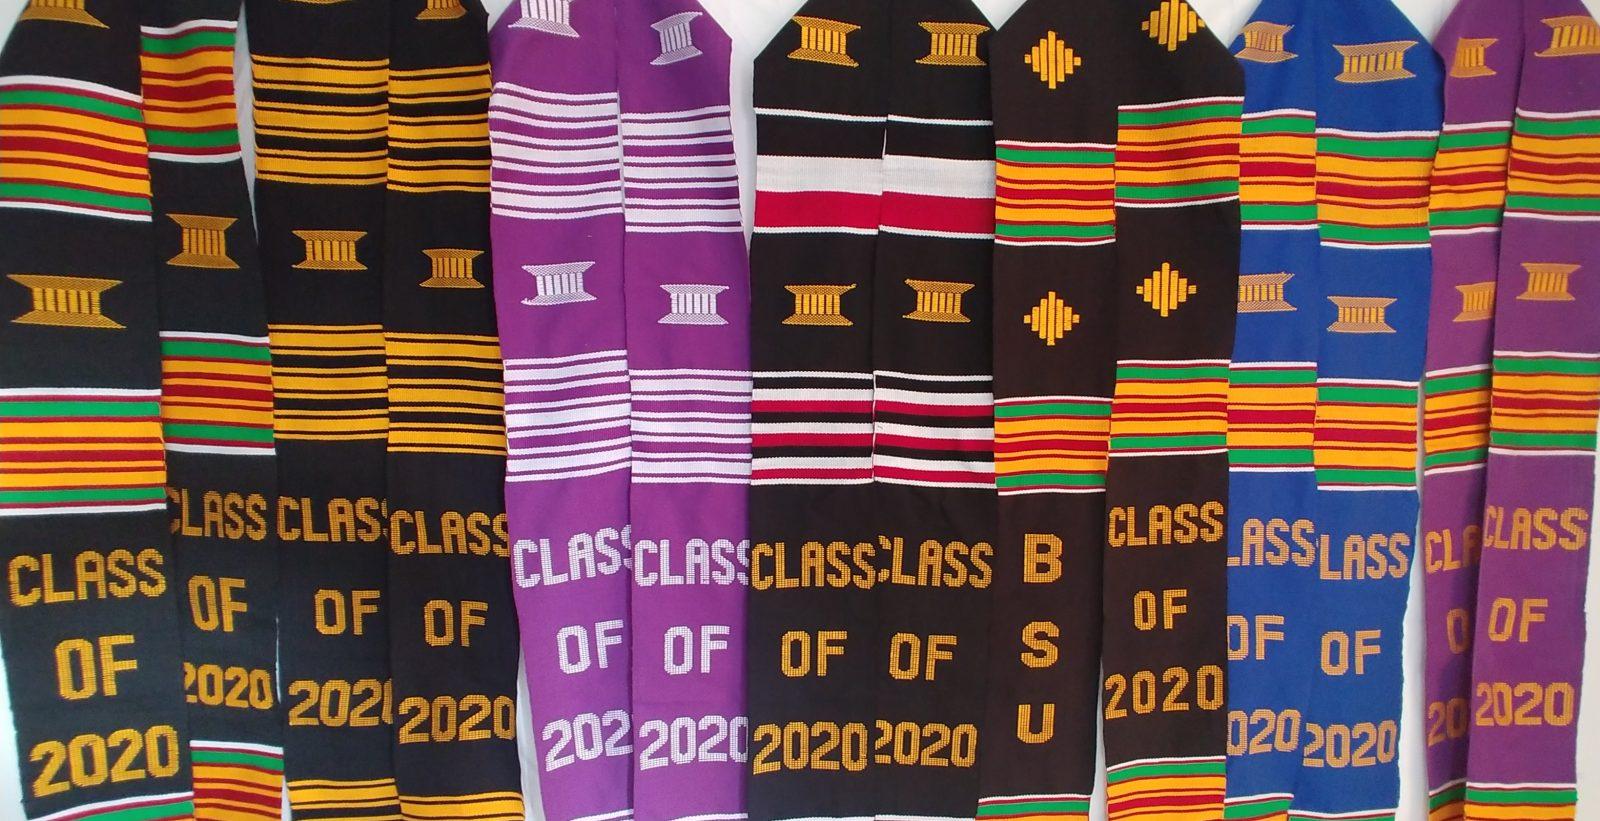 Graduation Kente Stole Class of 2020 African Graduation Sash Woven Kente Scarf